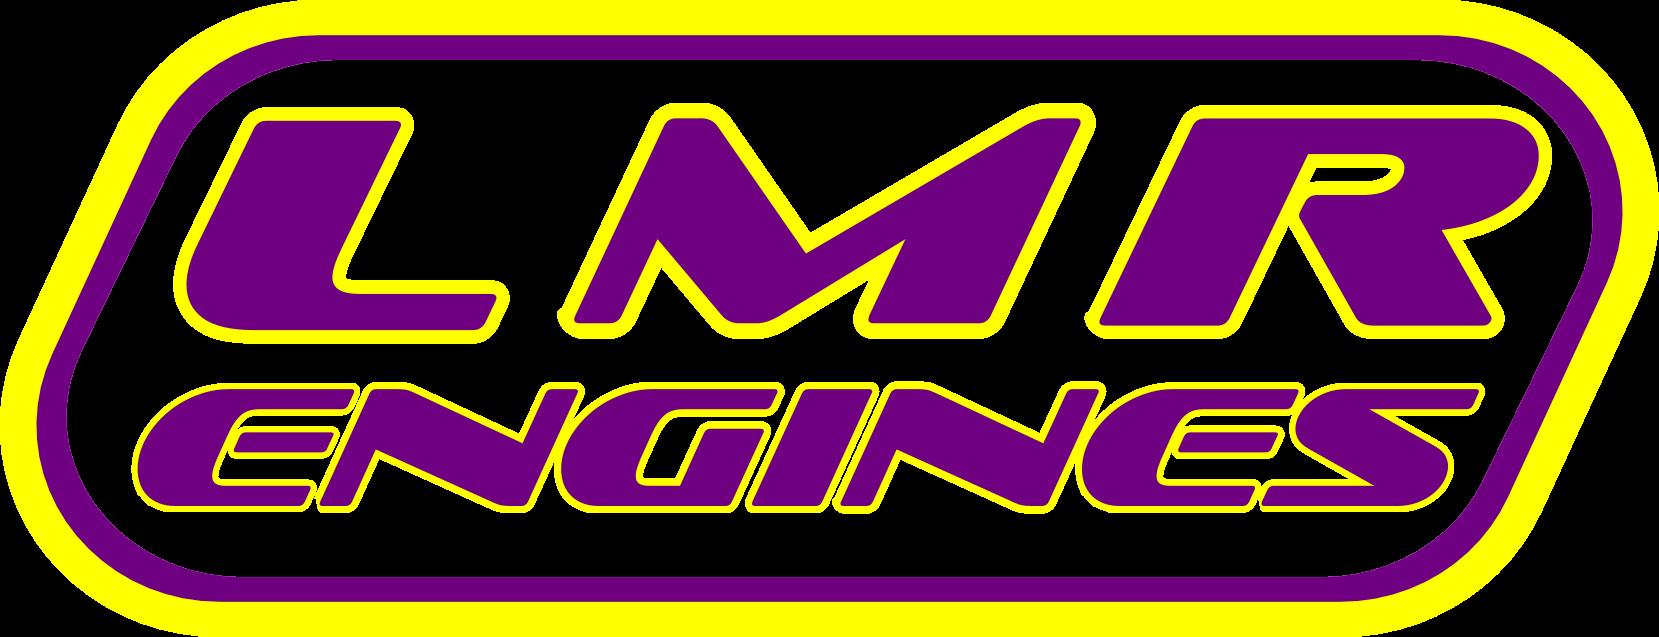 LMR ENGINES